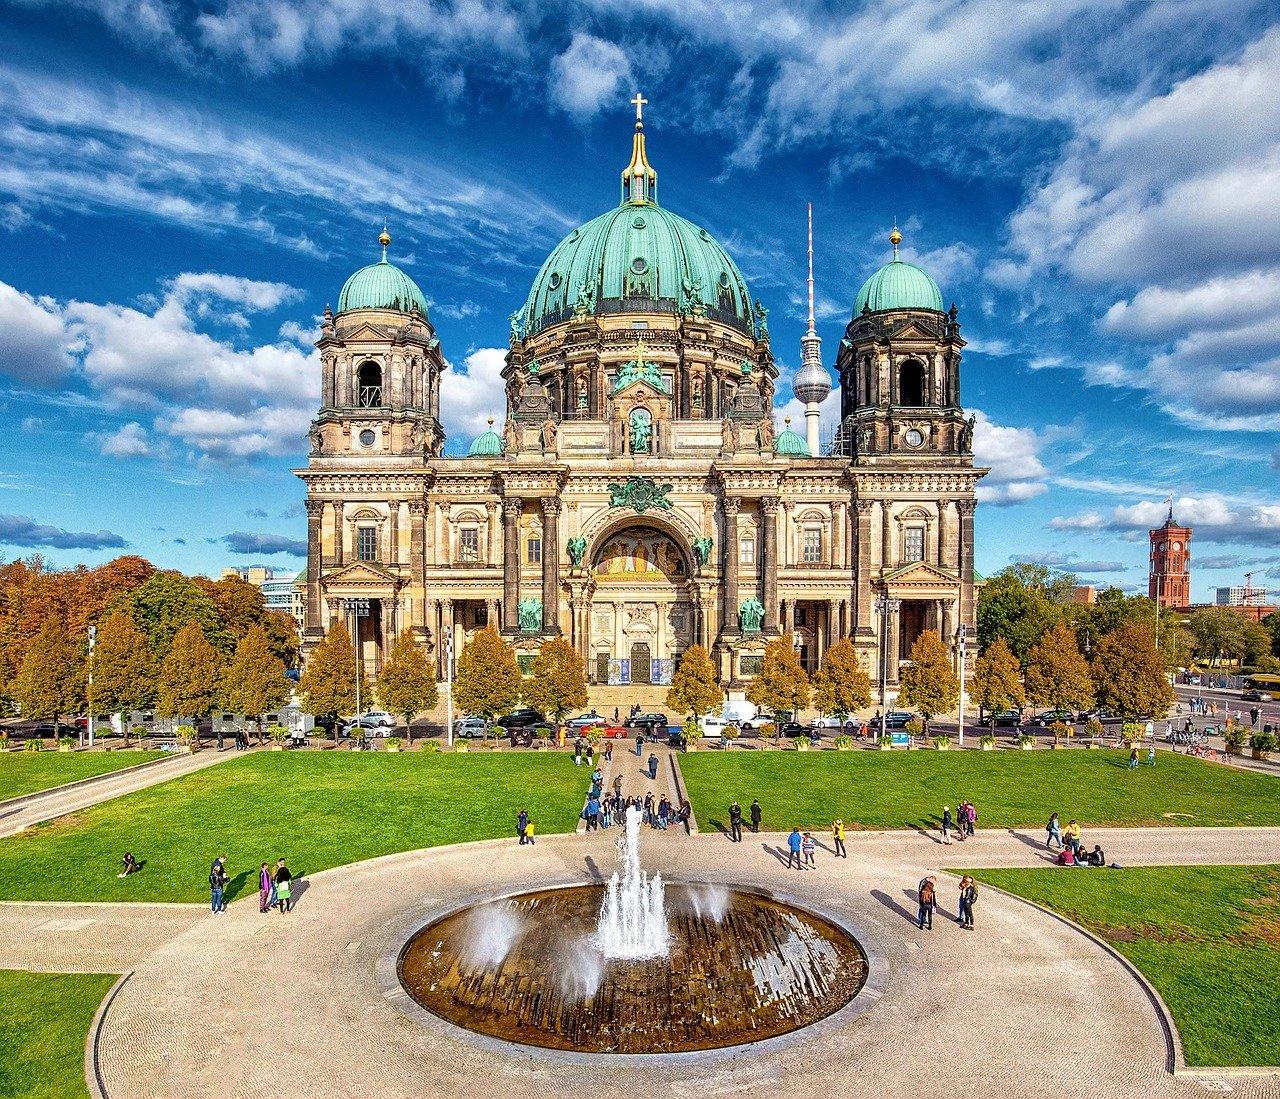 luoghi di interesse di Berlino